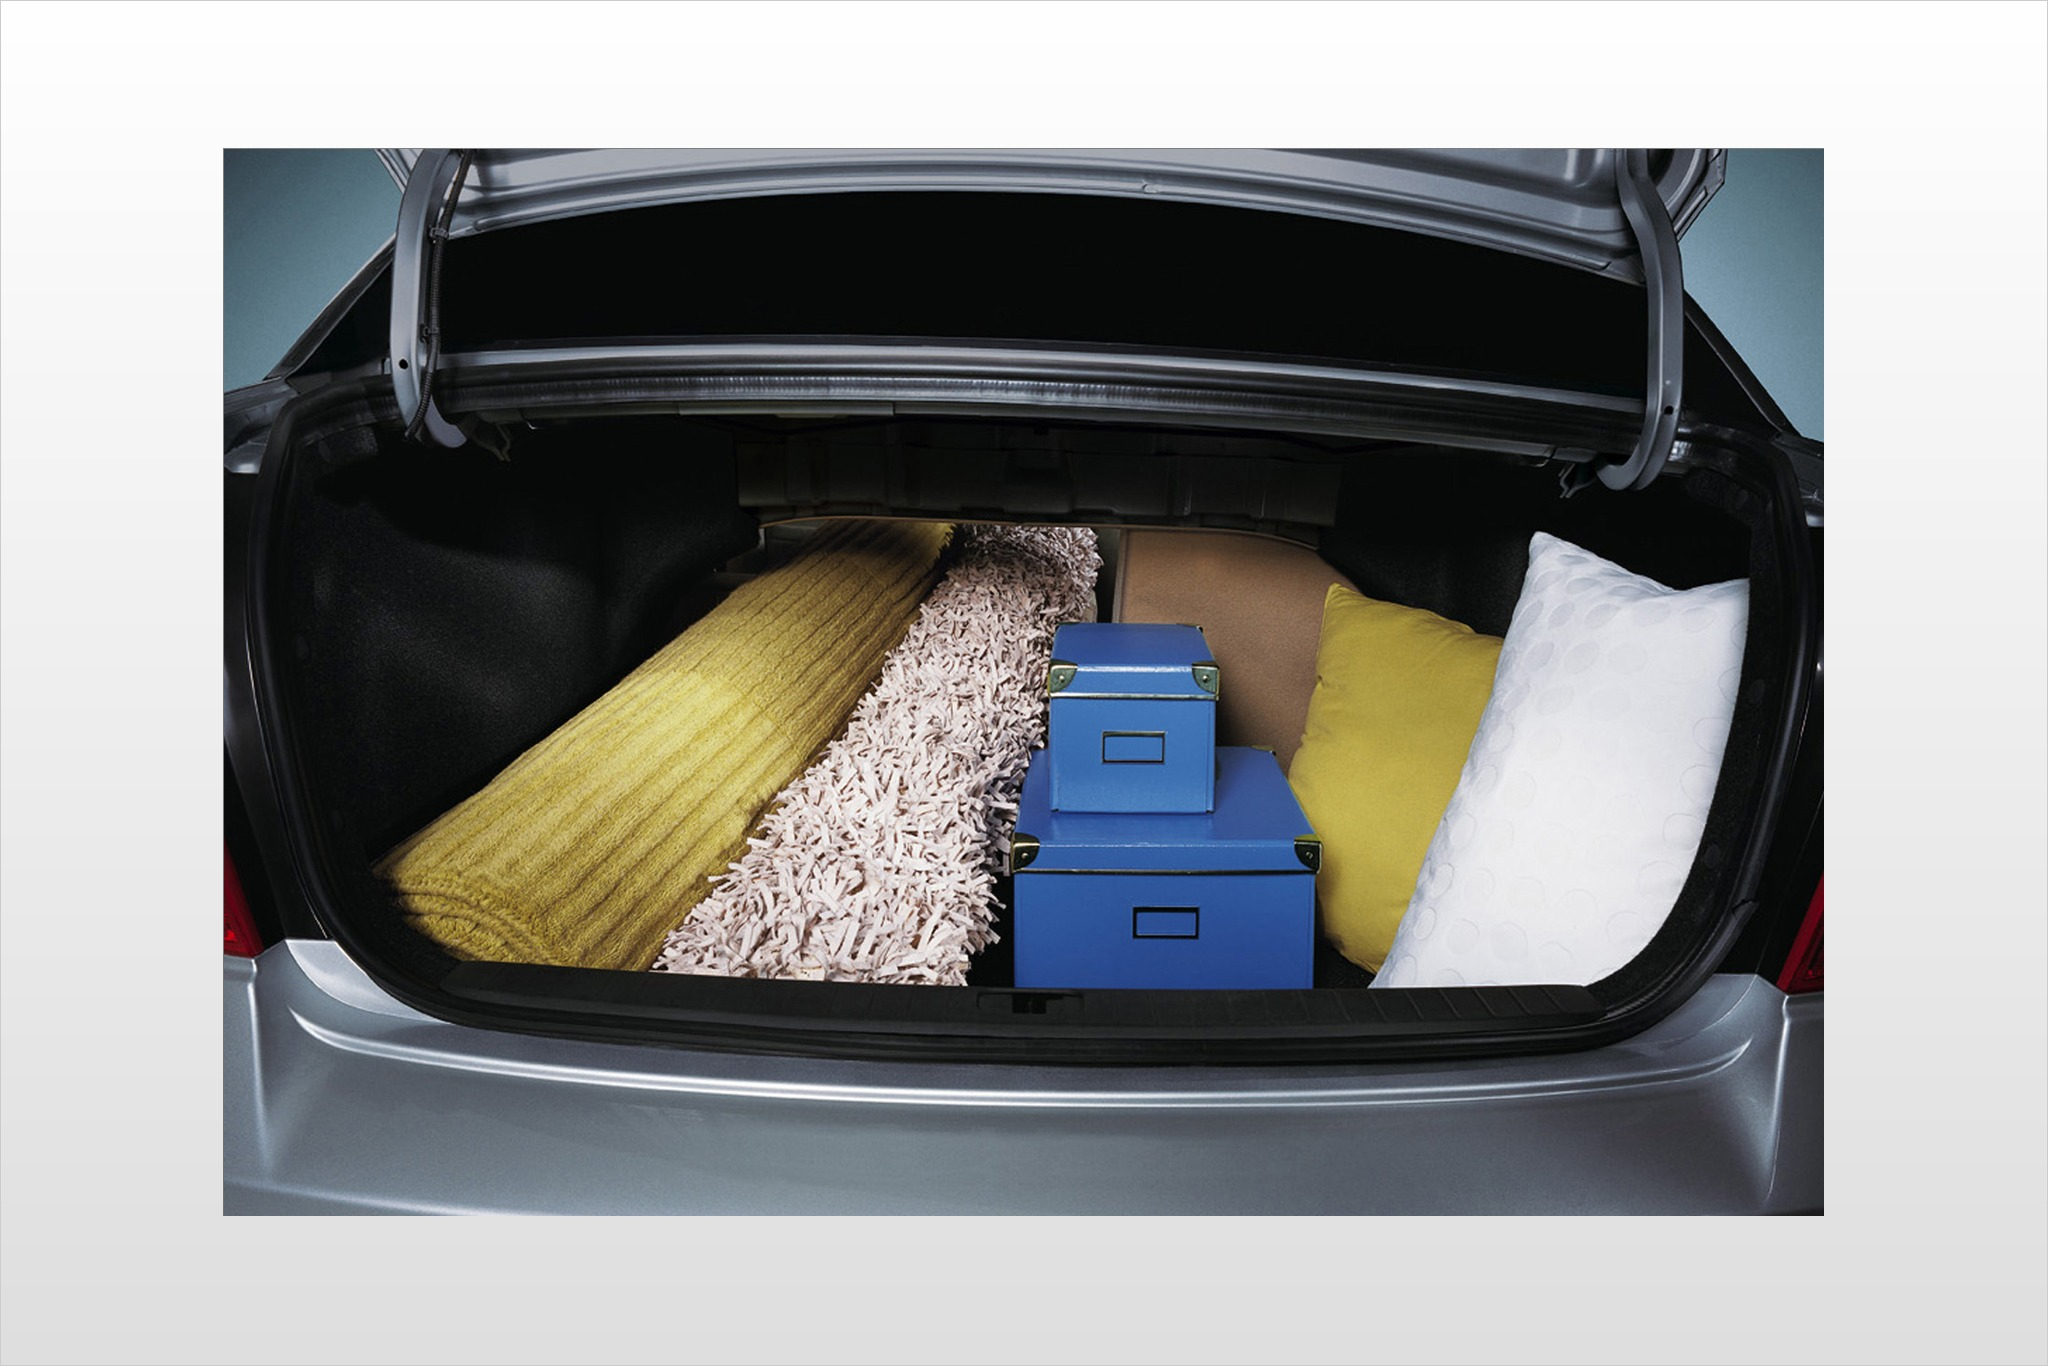 2010 Hyundai Accent Information And Photos Zombiedrive 4 Door Sedan 9 Gls S Interior